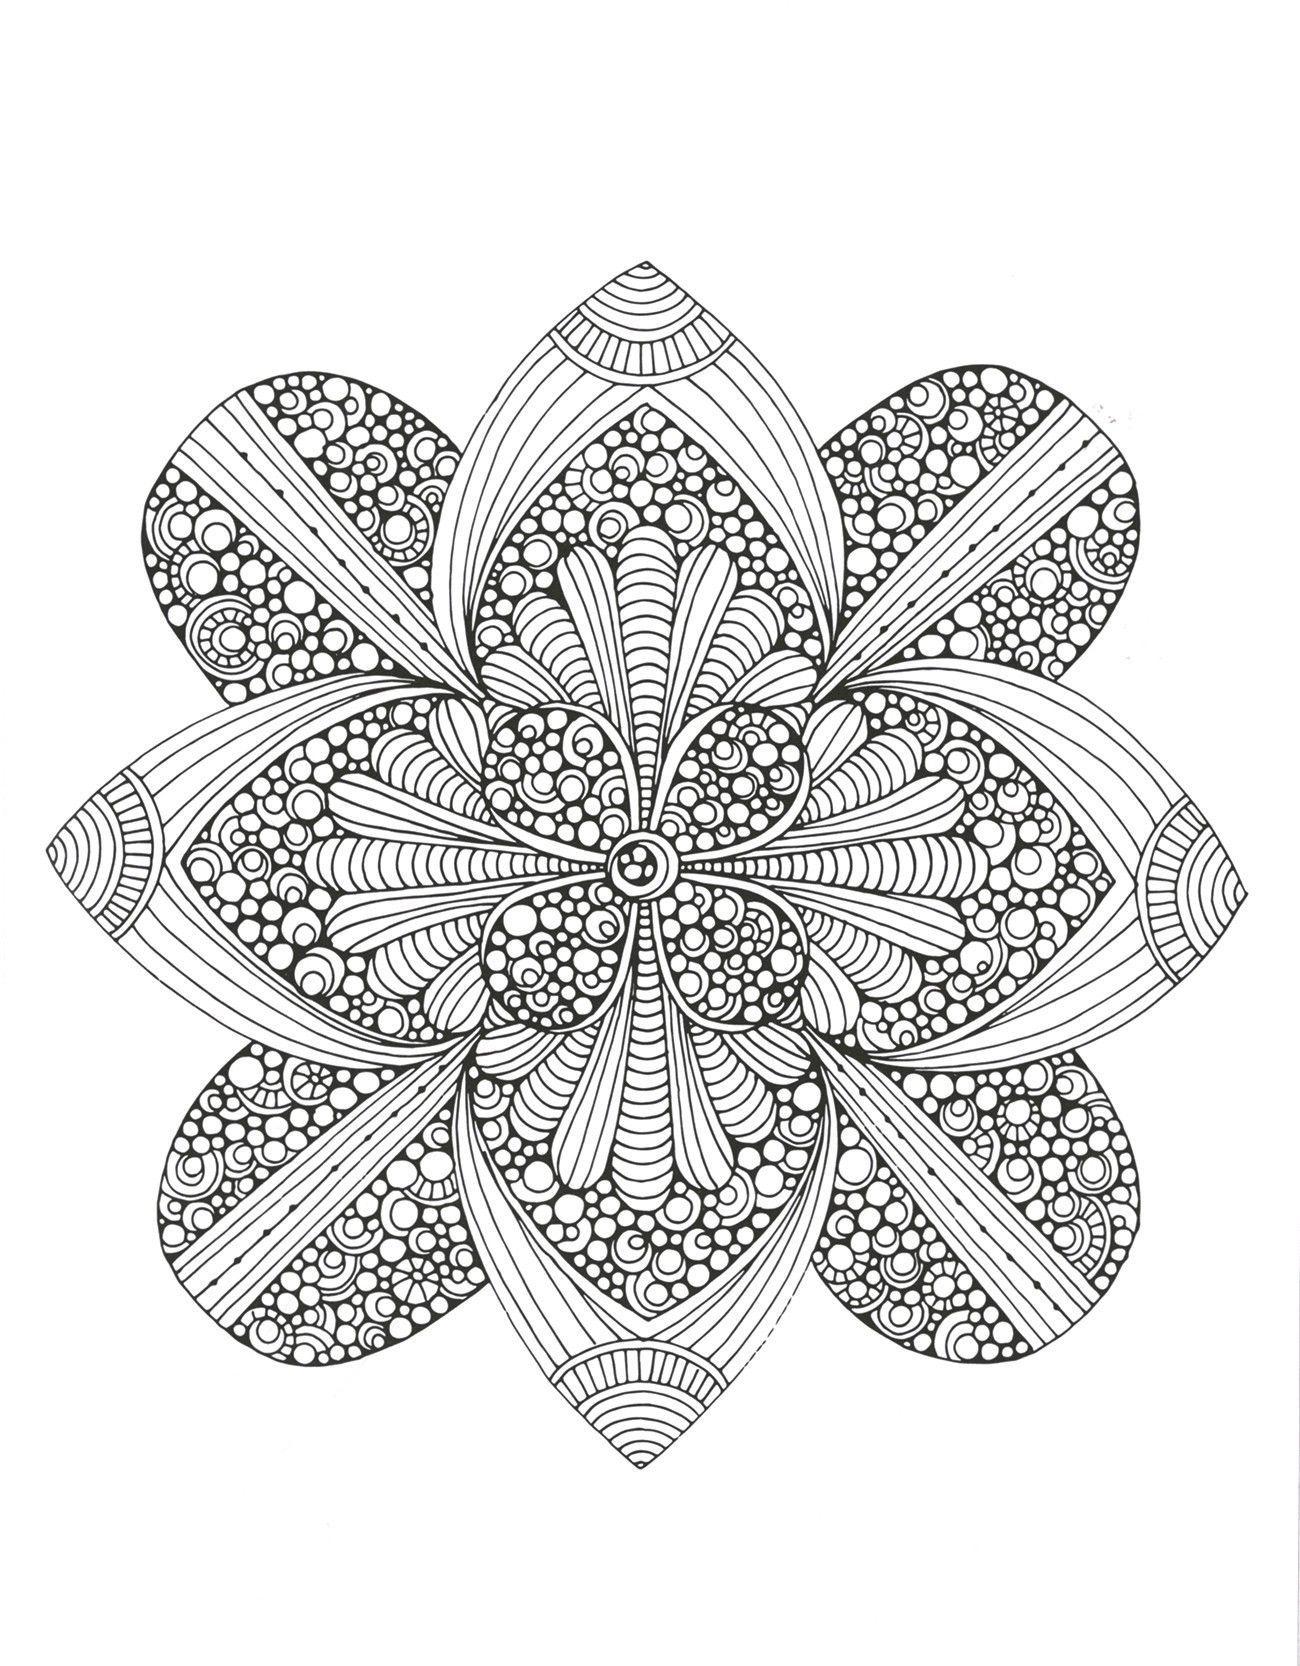 Creative Coloring Mandalas Adut Coloring Activity Book by ...